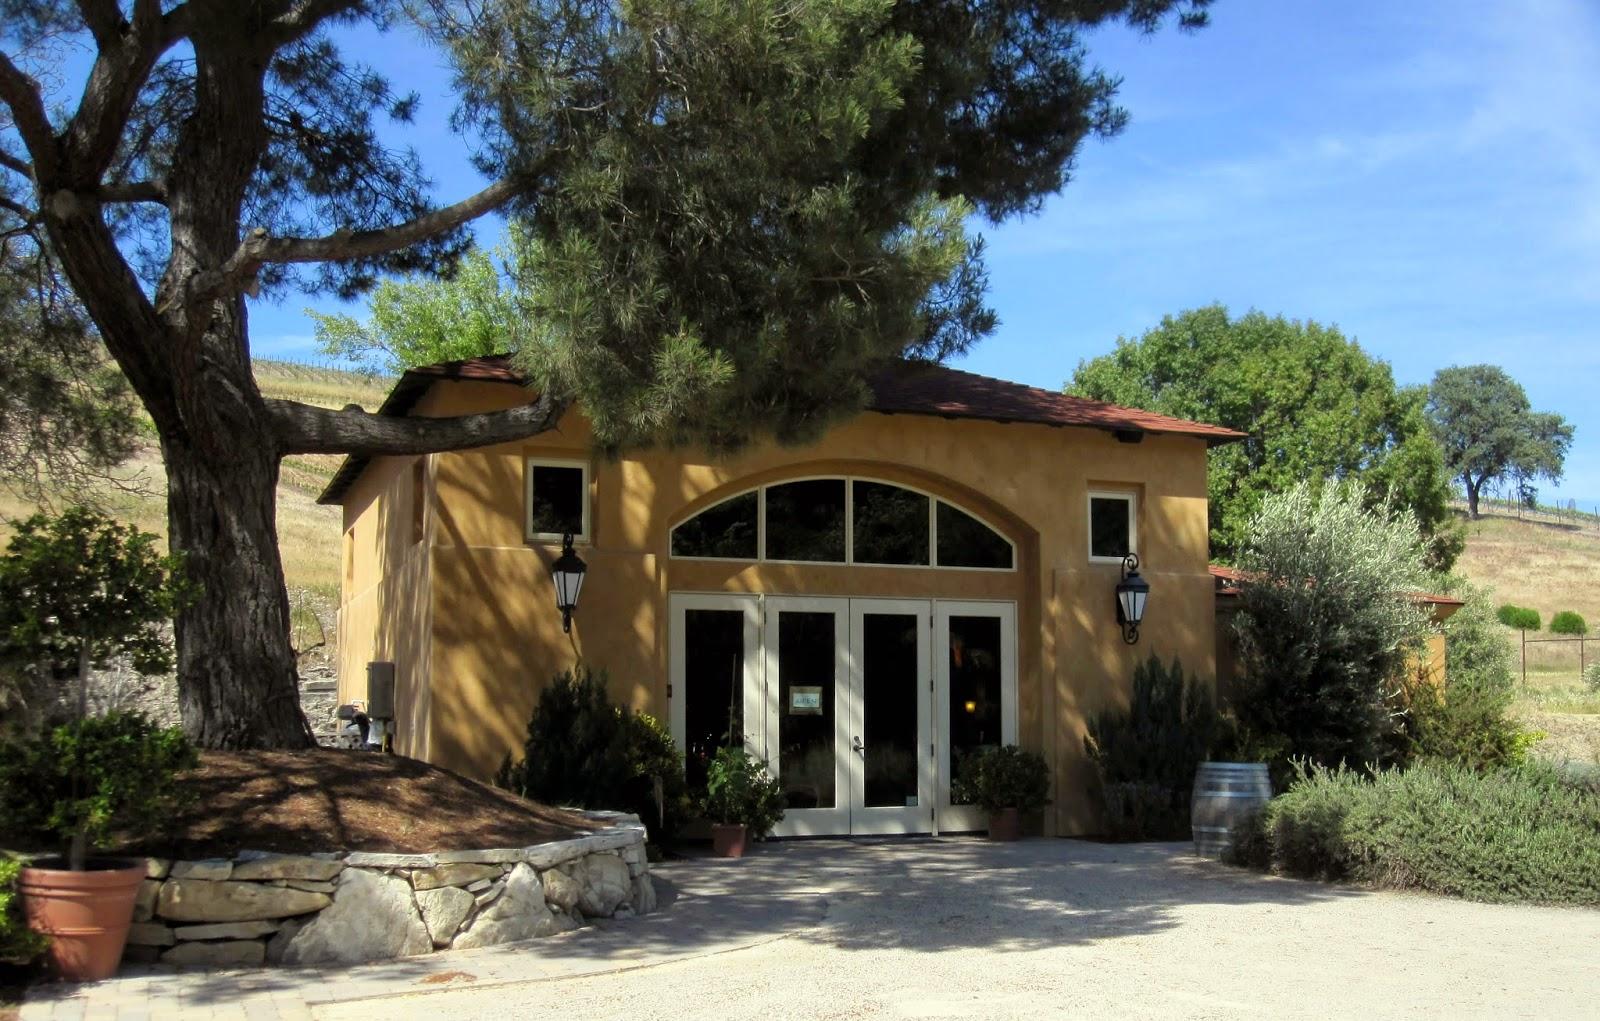 The Caliza Winery